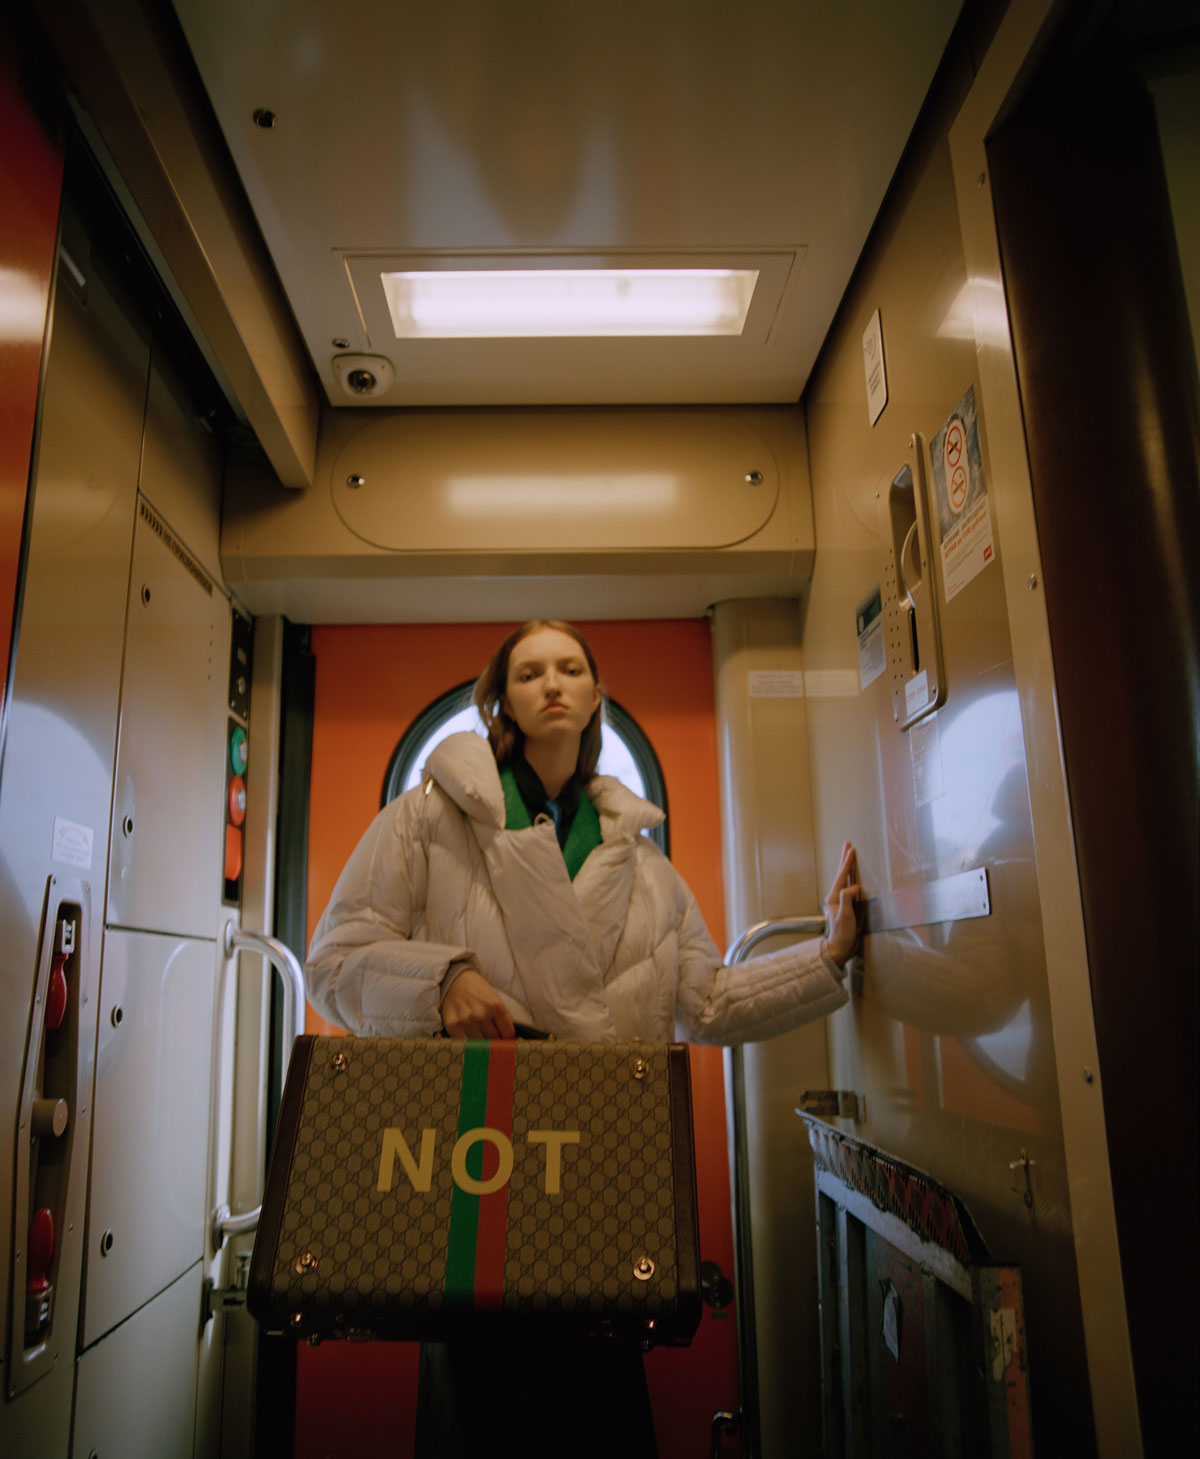 Elle Russia November 2020 在火车上的时尚大片 时尚图库 第1张